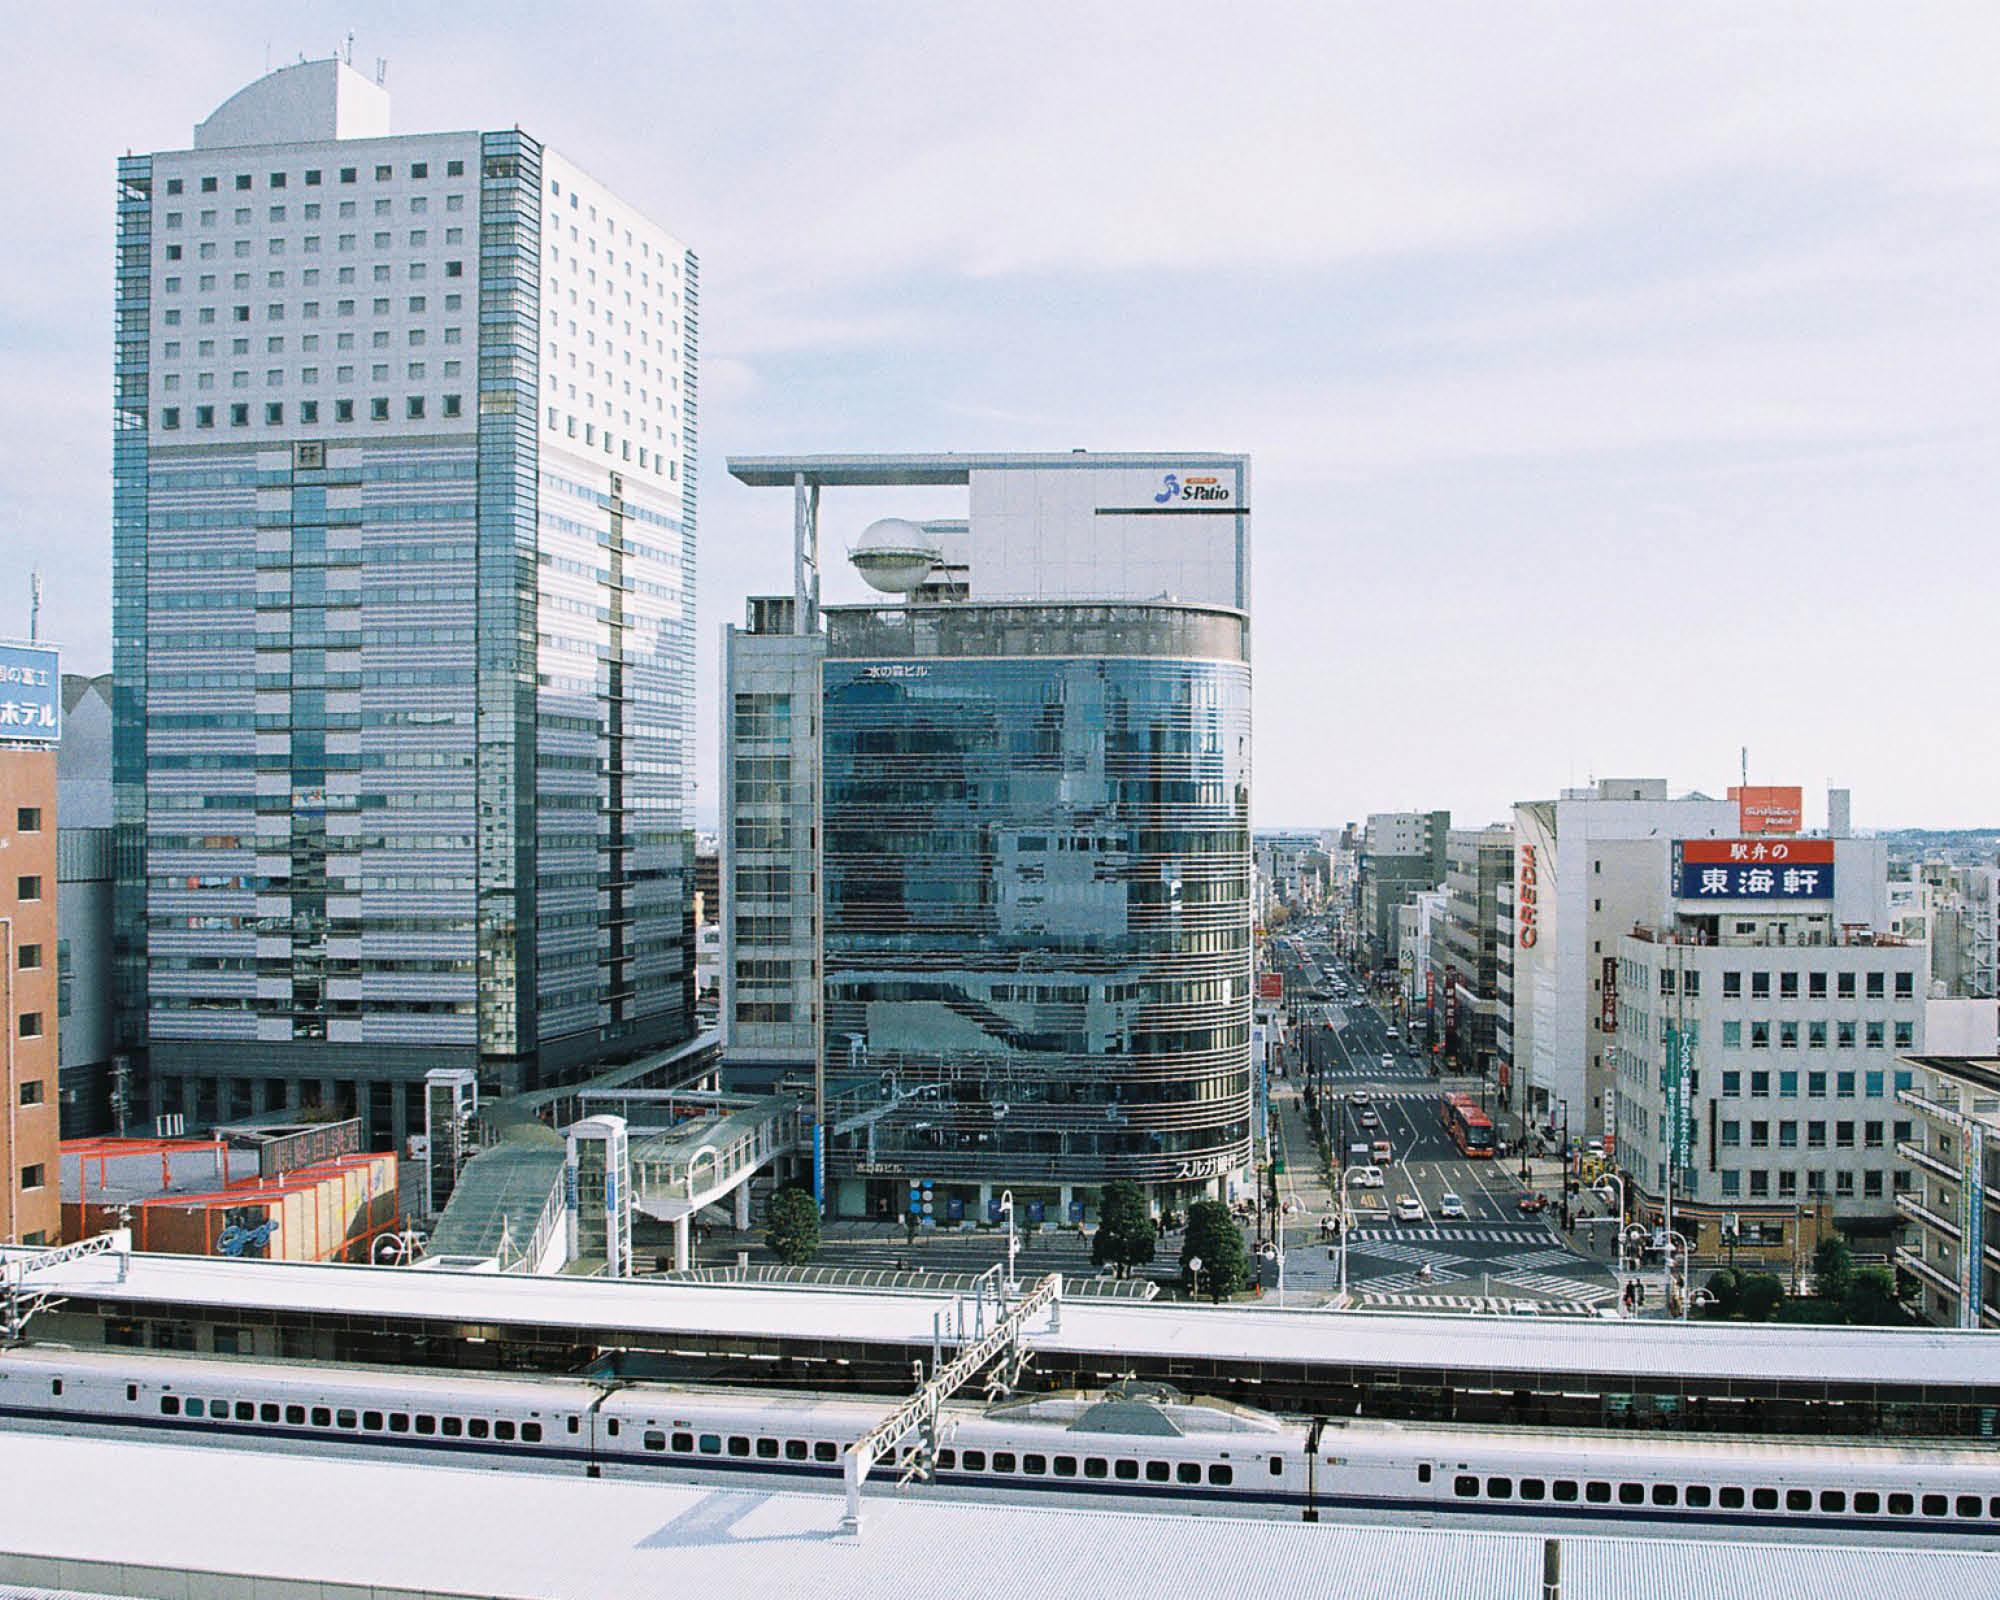 https://www.shizuoka-cb.com/wp-content/uploads/2021/03/photo-top9.jpg